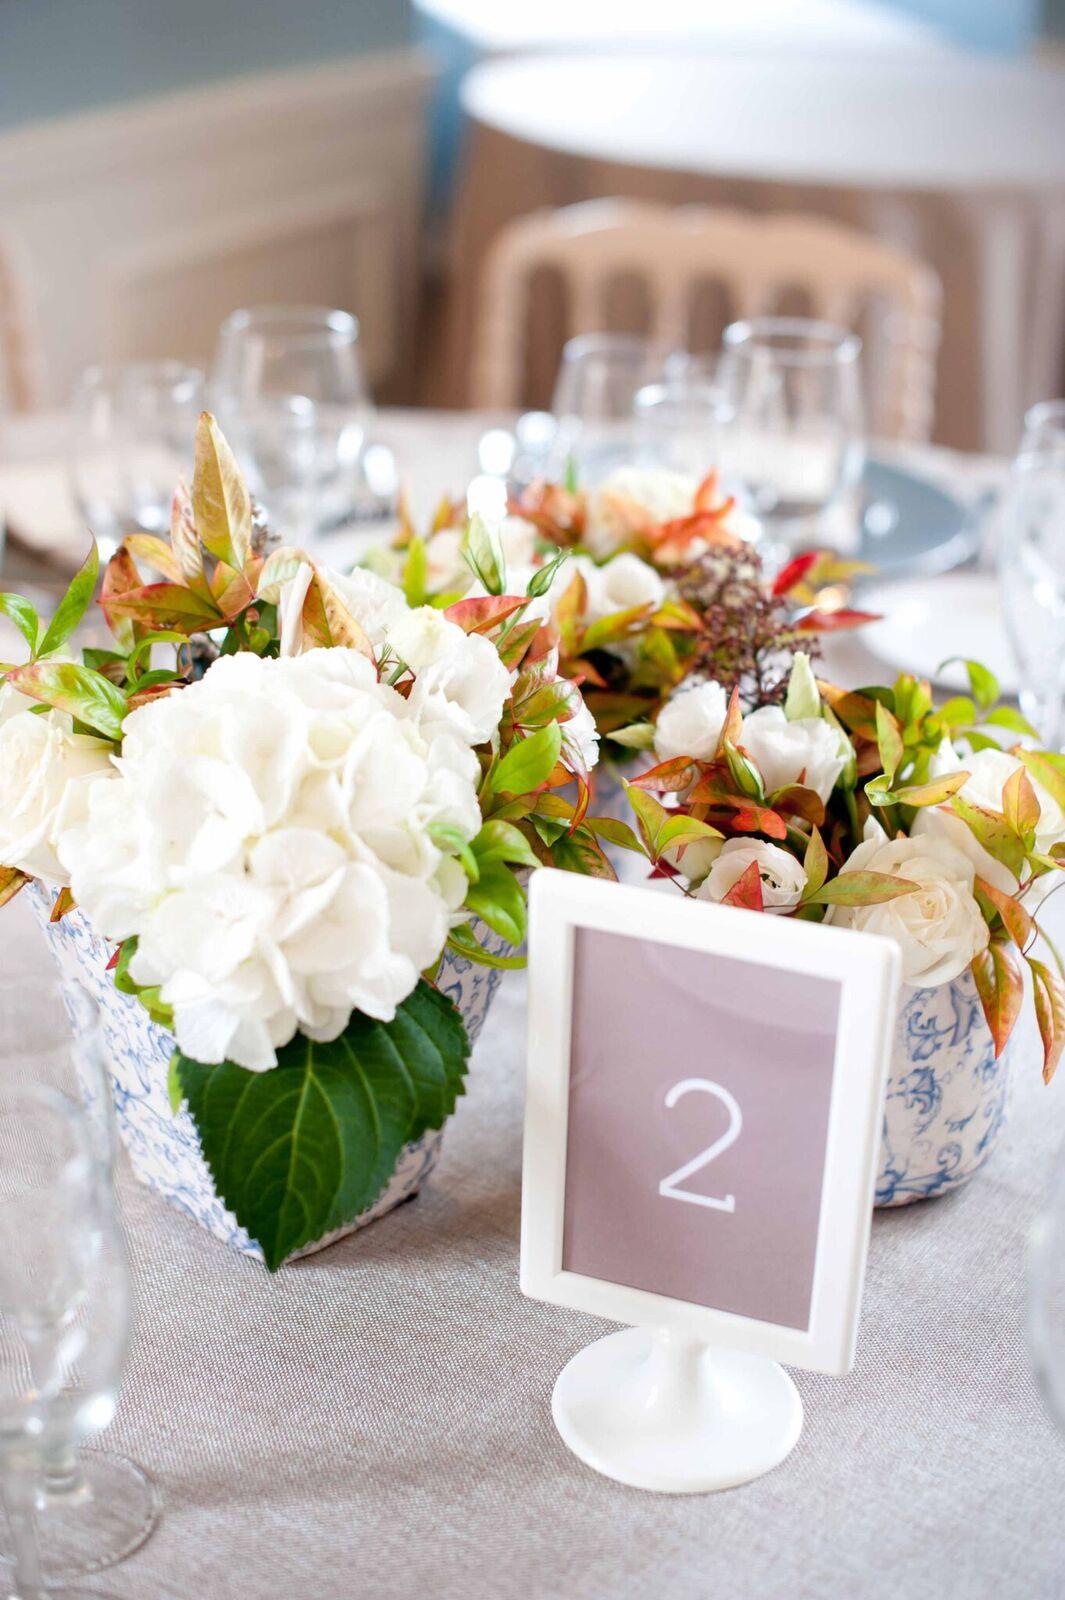 Si-Quiero-Wedding-Planner-Sira-Antequera-Patricia-Javier-011